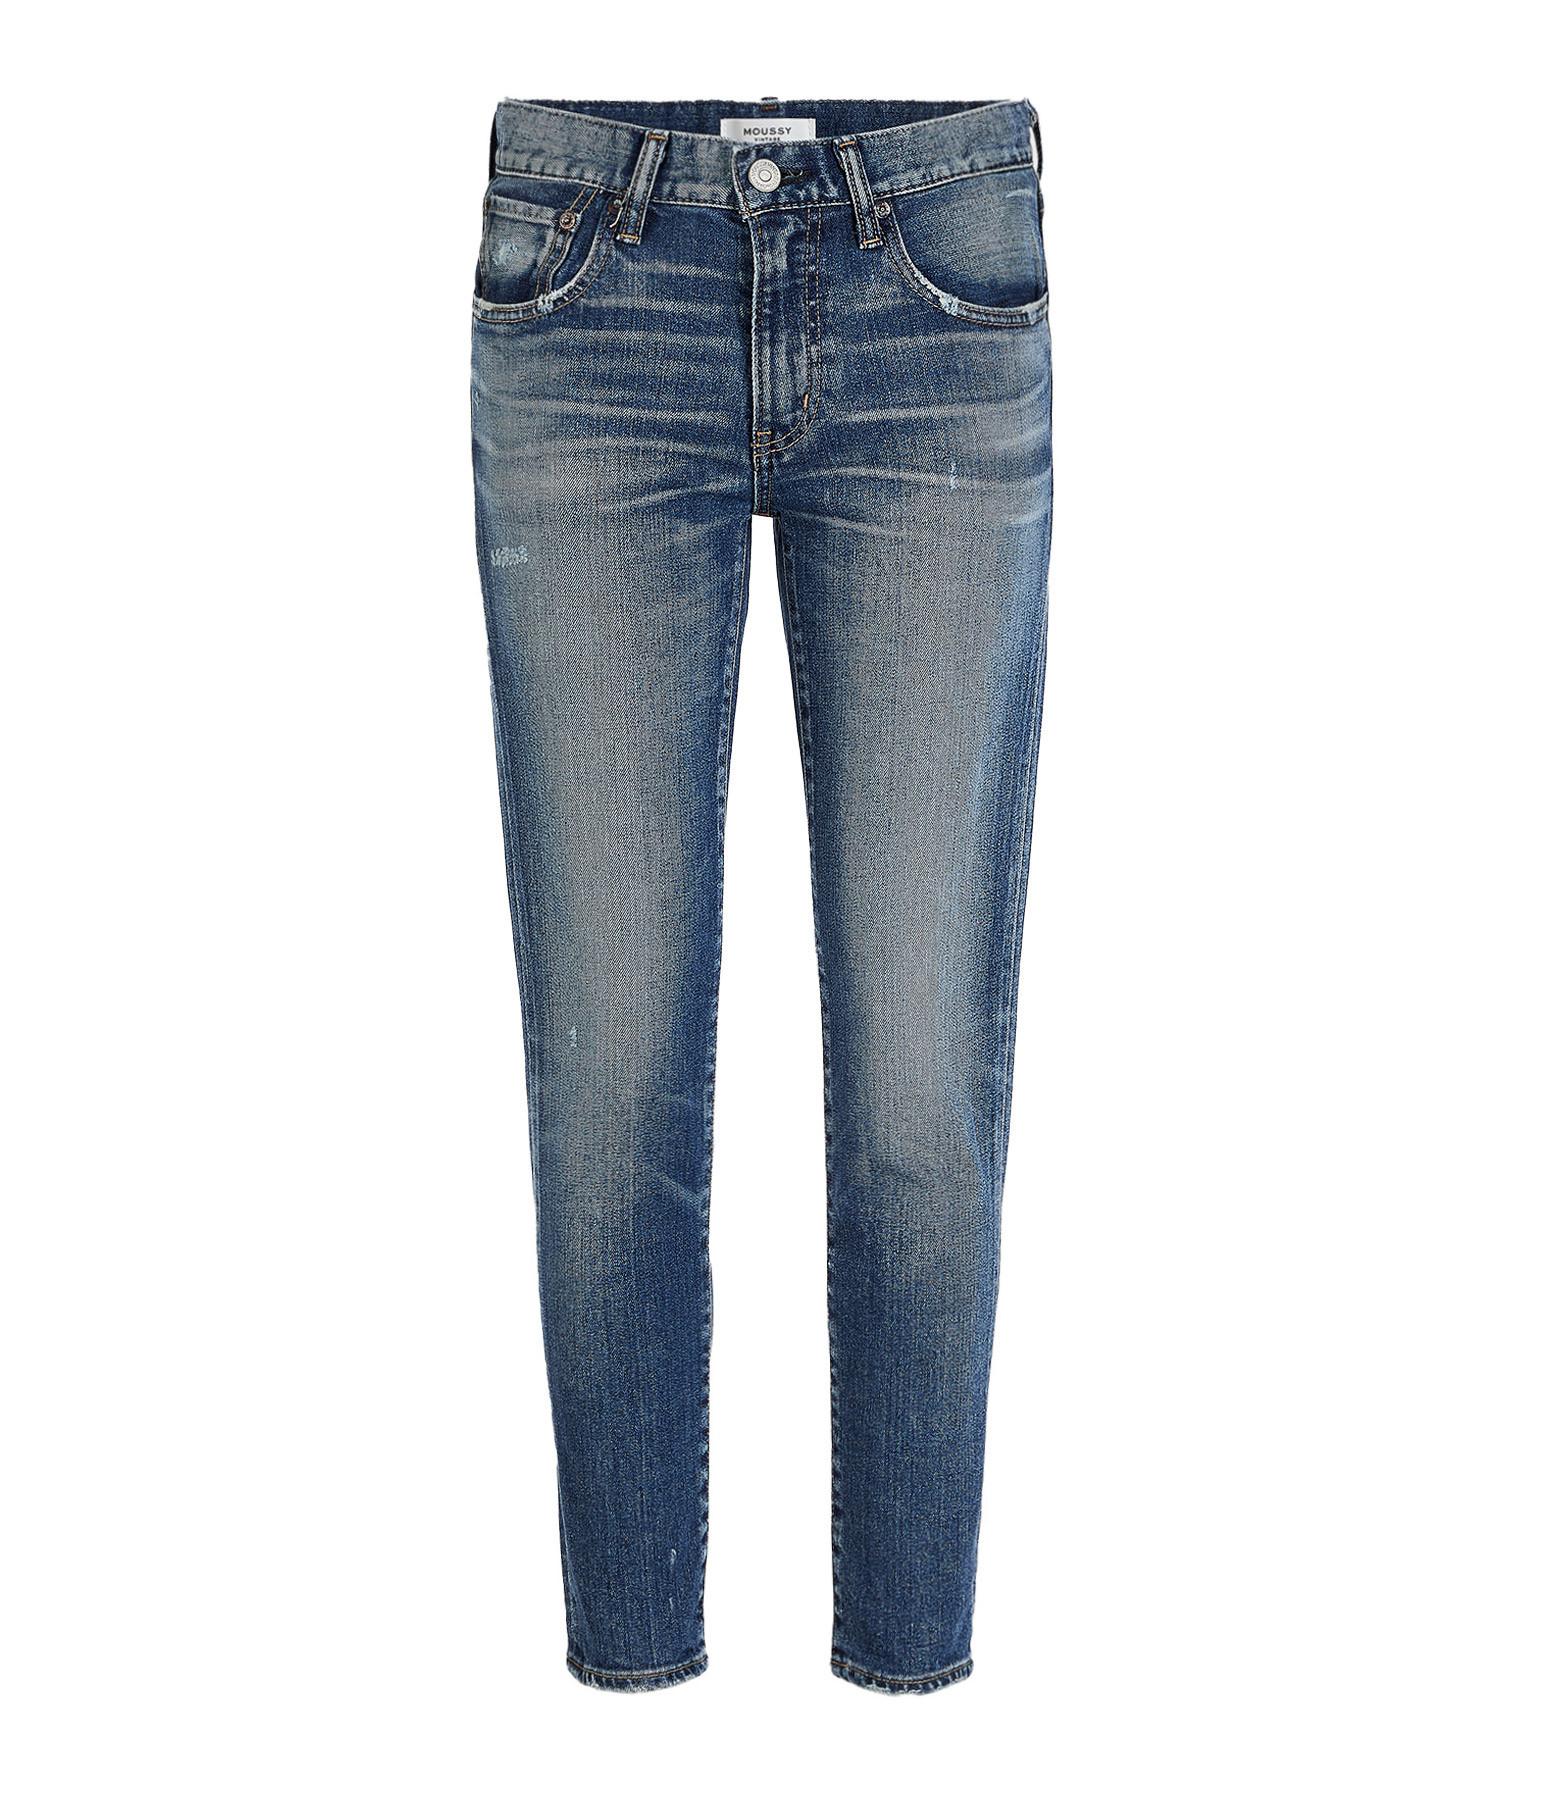 MOUSSY VINTAGE - Jean Sundance Skinny Coton Denim Bleu